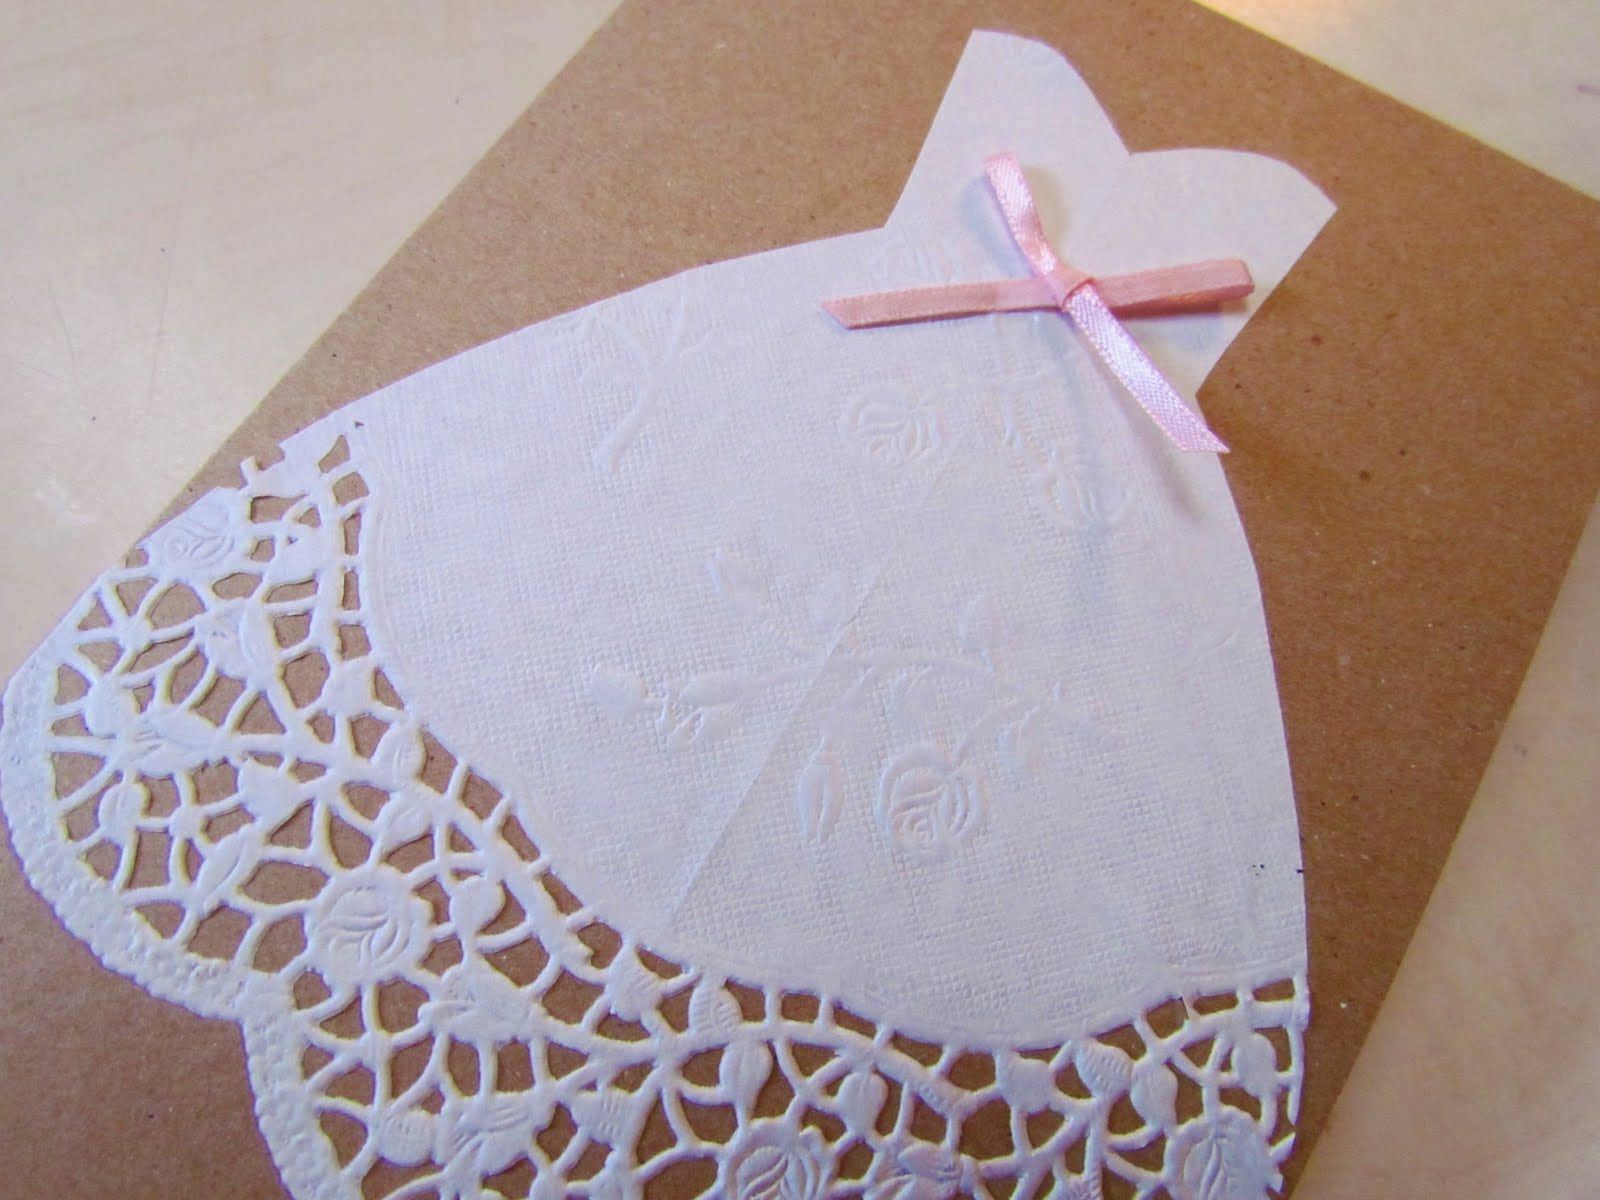 Pin by magnolia aristondo vargas on diy wedding pinterest bridal bridal showers filmwisefo